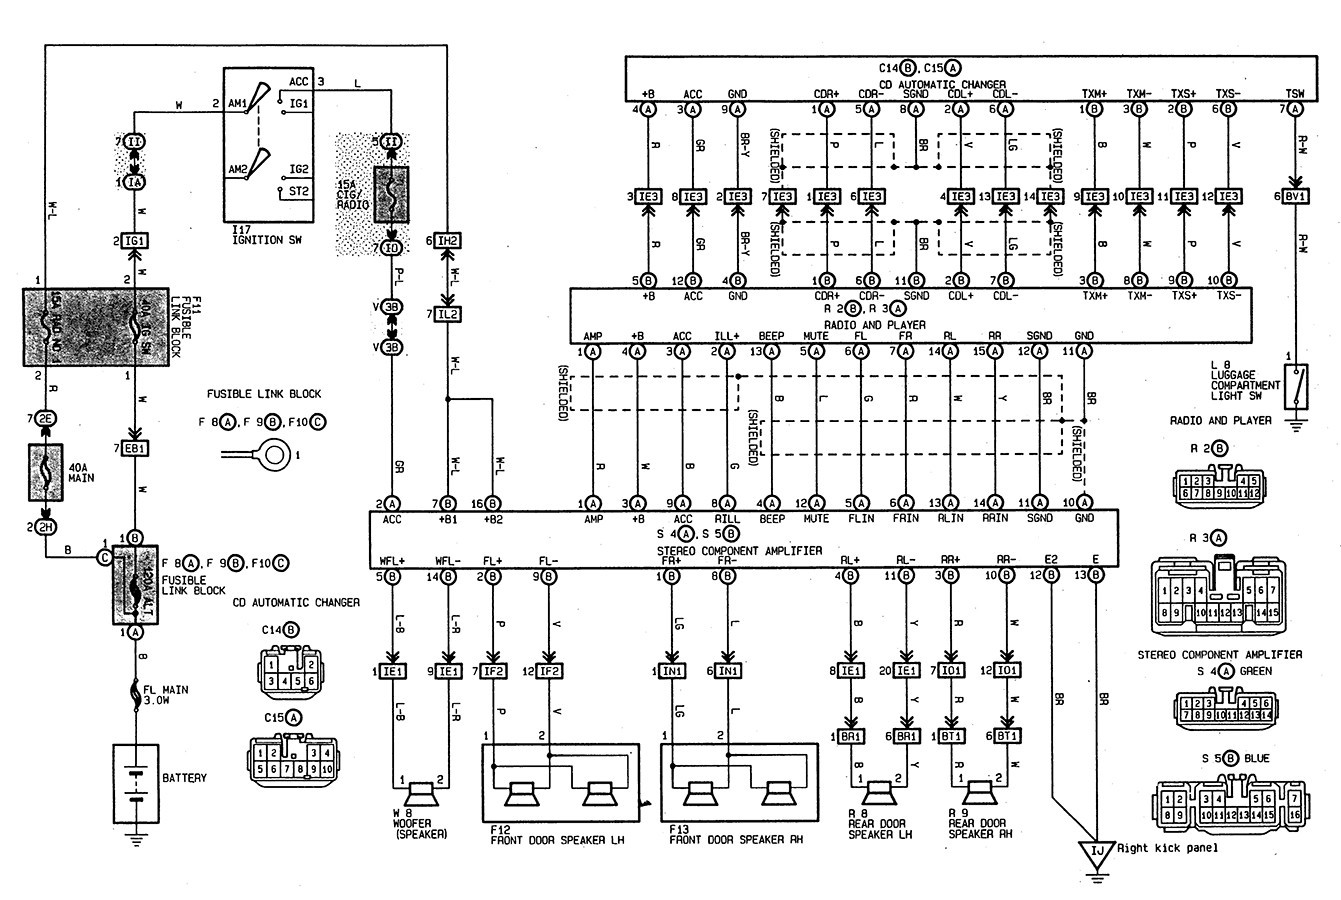 Toyota Wiring Diagram Color Codes Luxury Wiring Diagram Free toyota Wiring Diagrams Automotive In Schematics Color